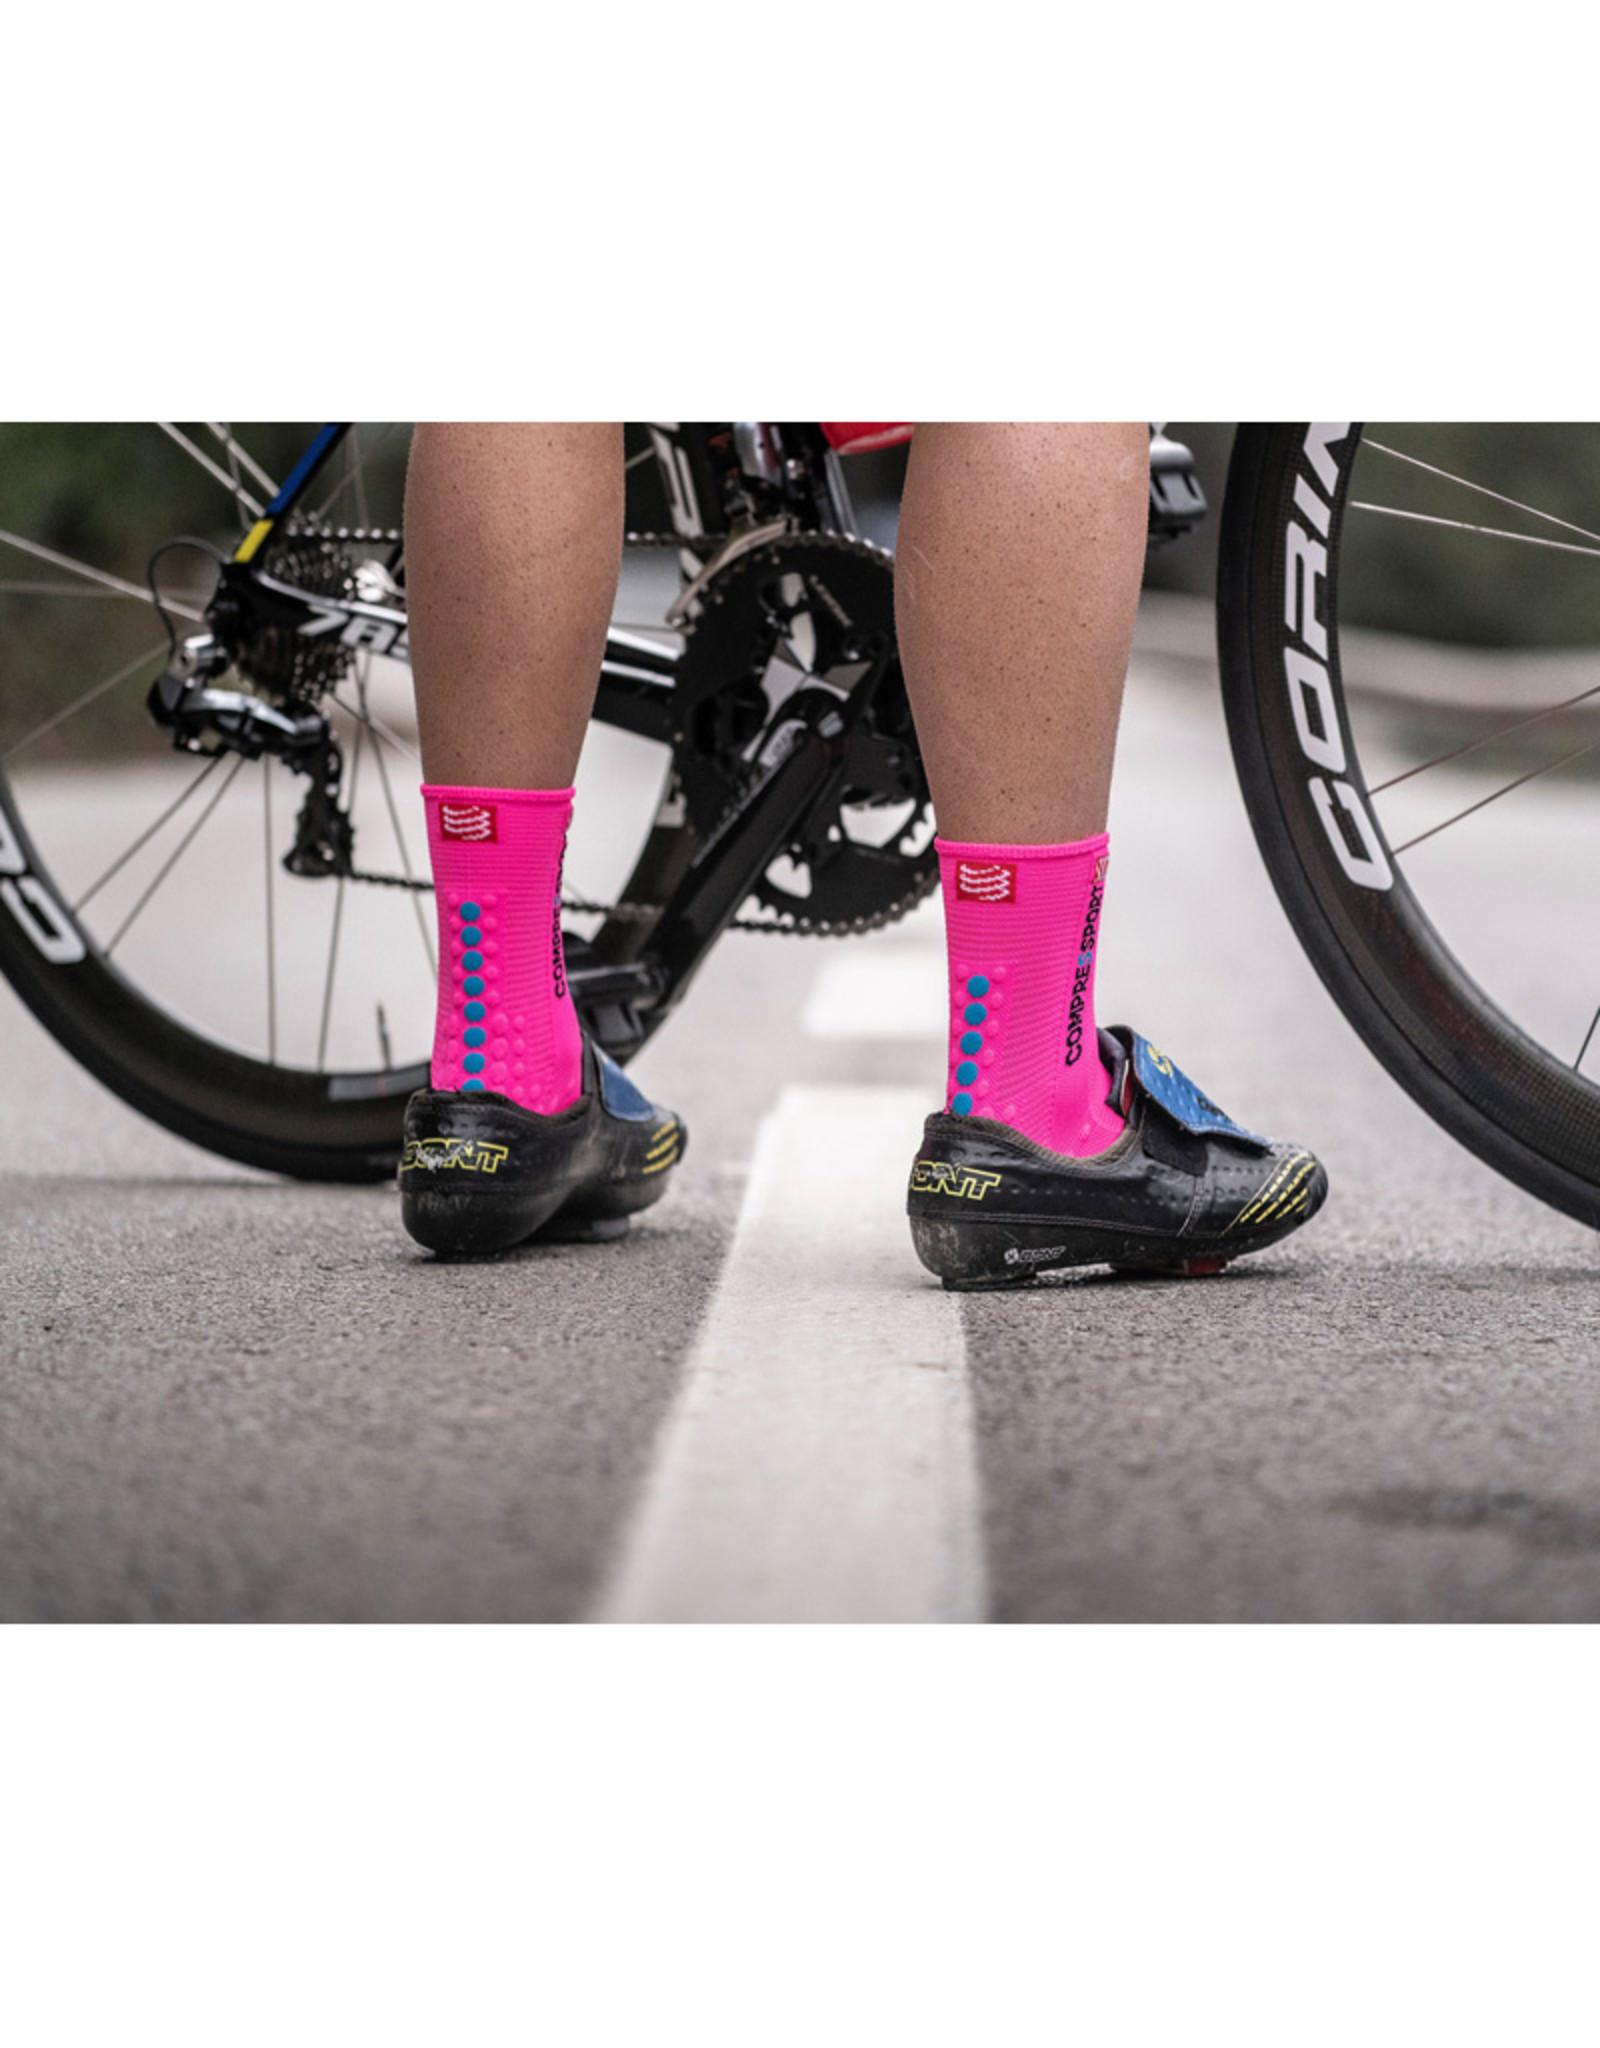 Compressport Pro Racing Socks V3.0 Bike Fietssokken - Roze